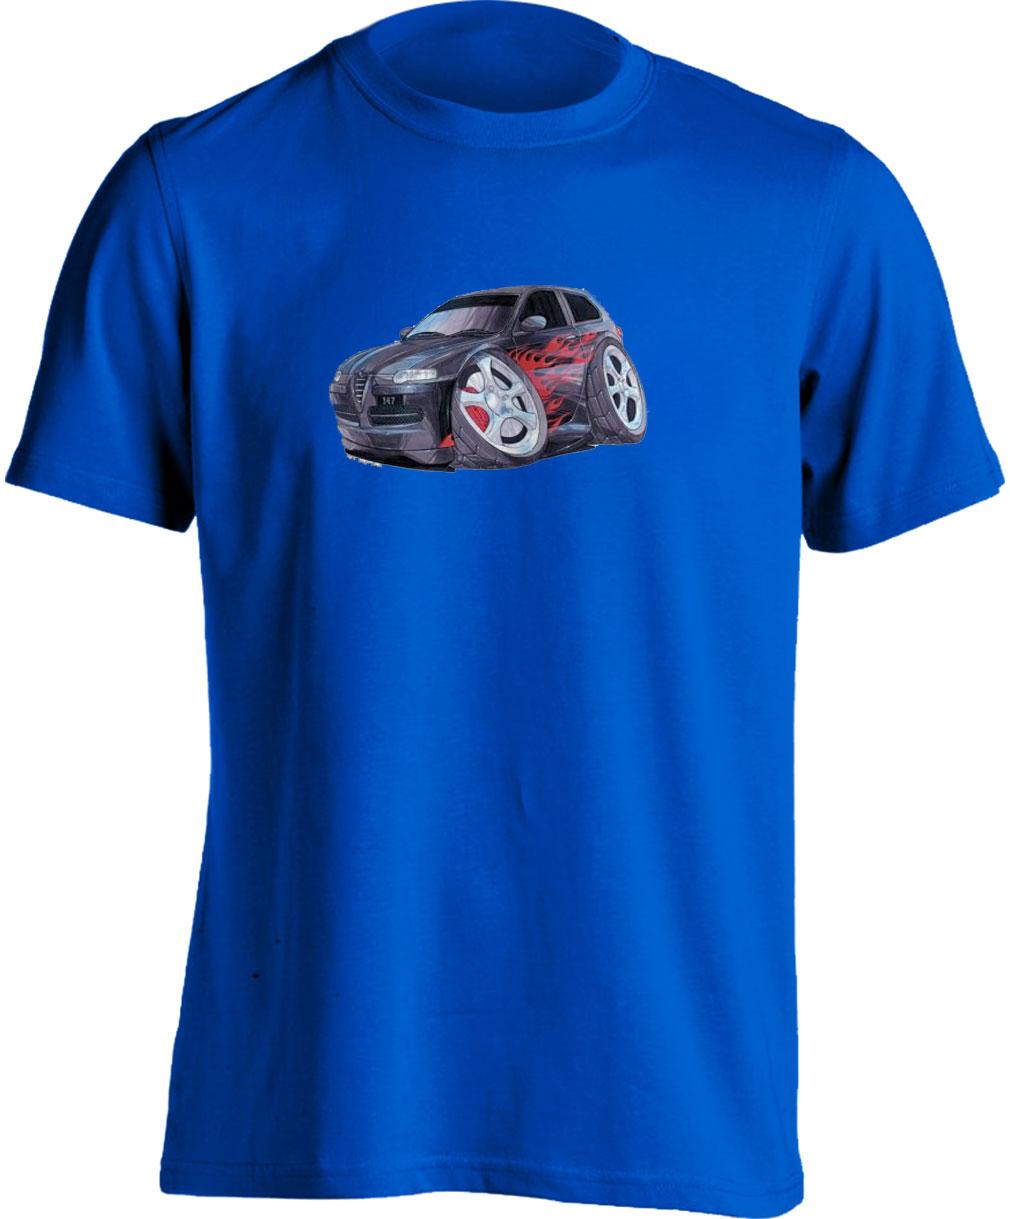 Koolart 147-2787Tuning Black Alfa Romeo Child's T Shirt